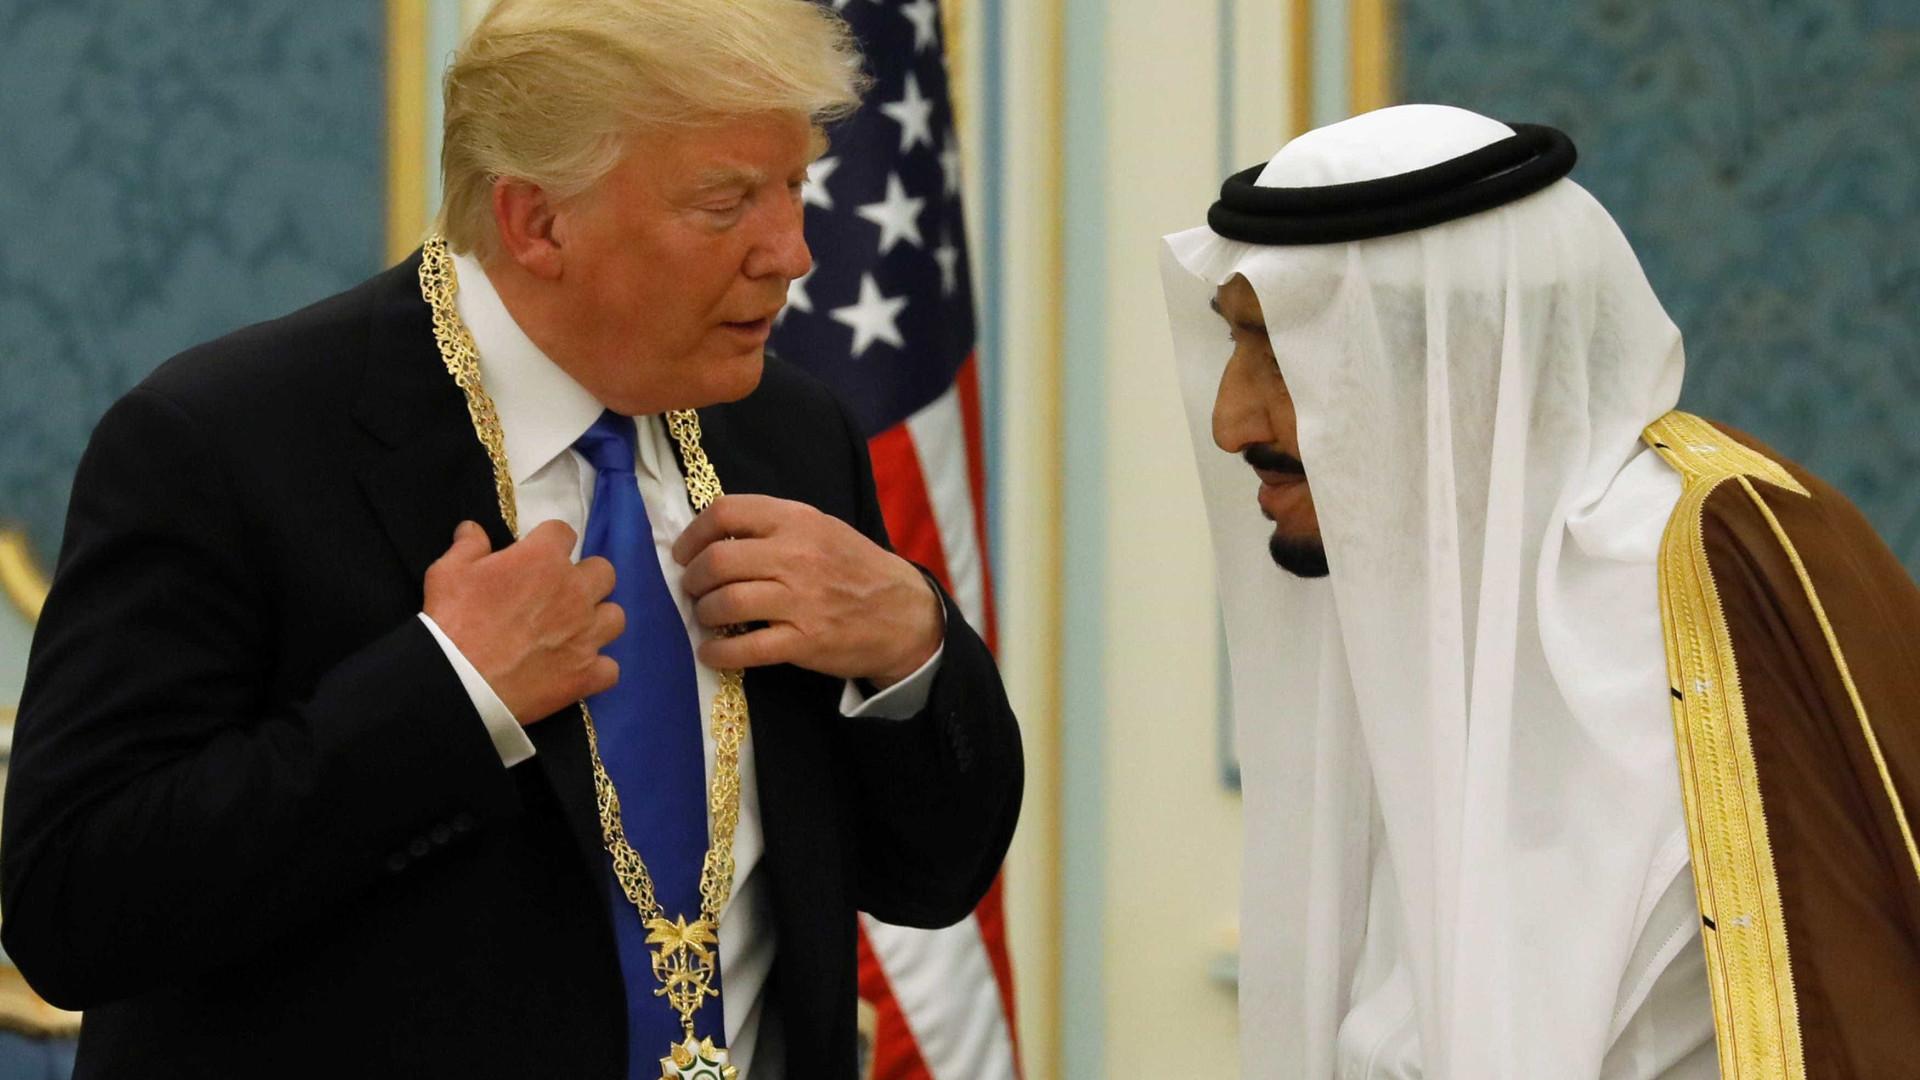 Rei Salman diz que visita de Trump contribui para a segurança global